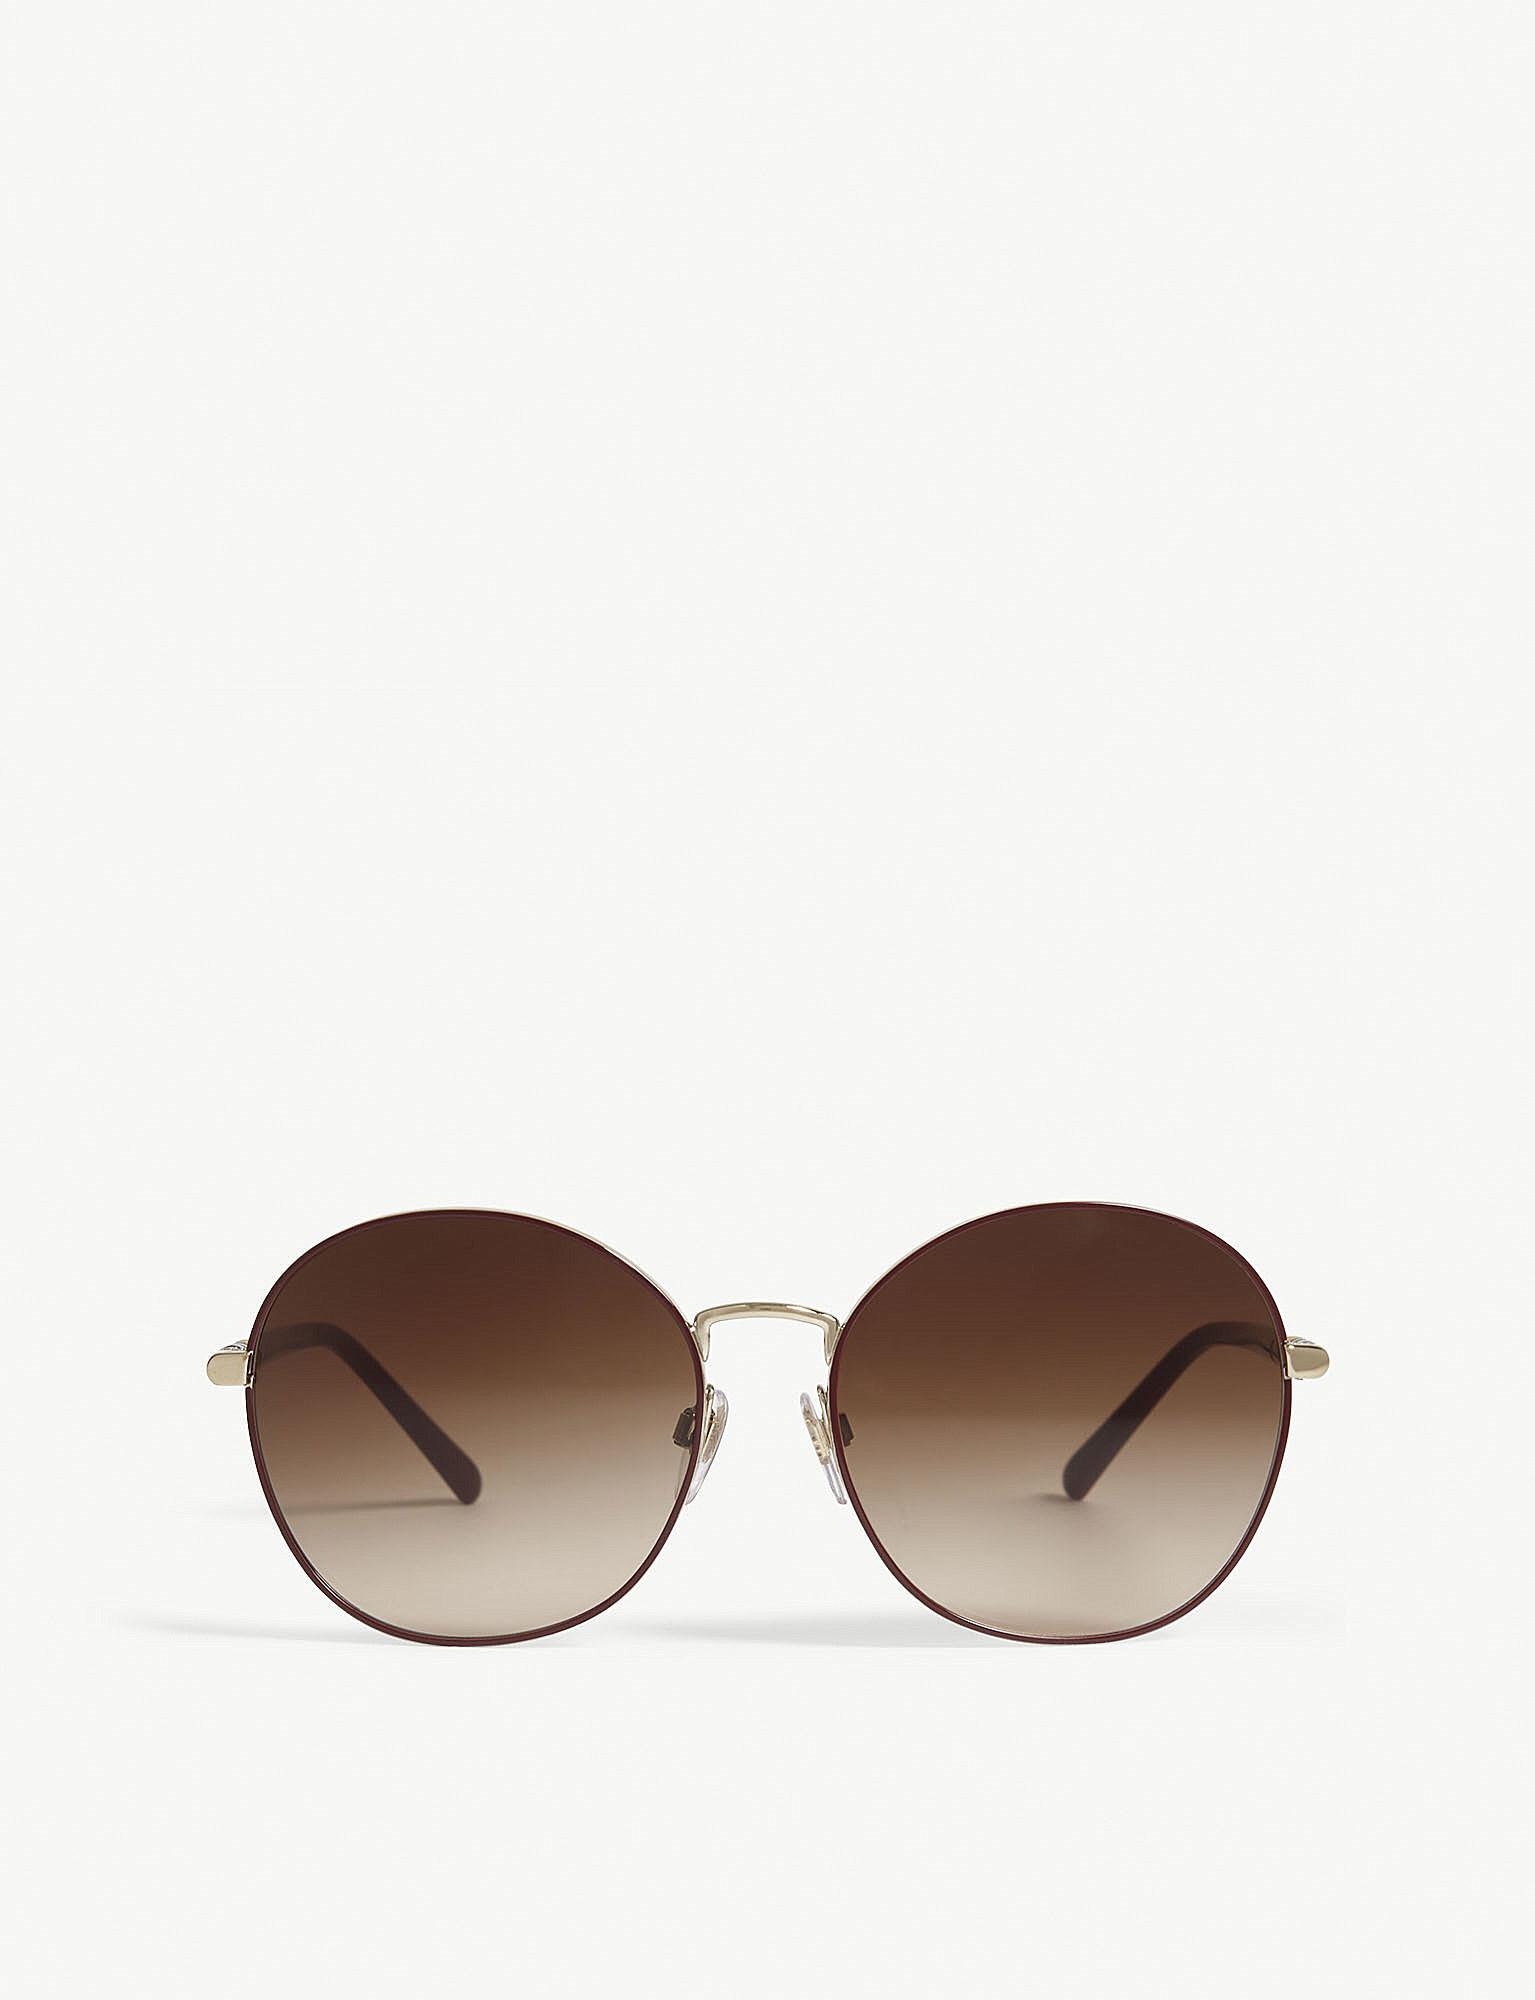 81dfe83c3f2 Burberry Be3094 Round-frame Sunglasses in Metallic - Lyst